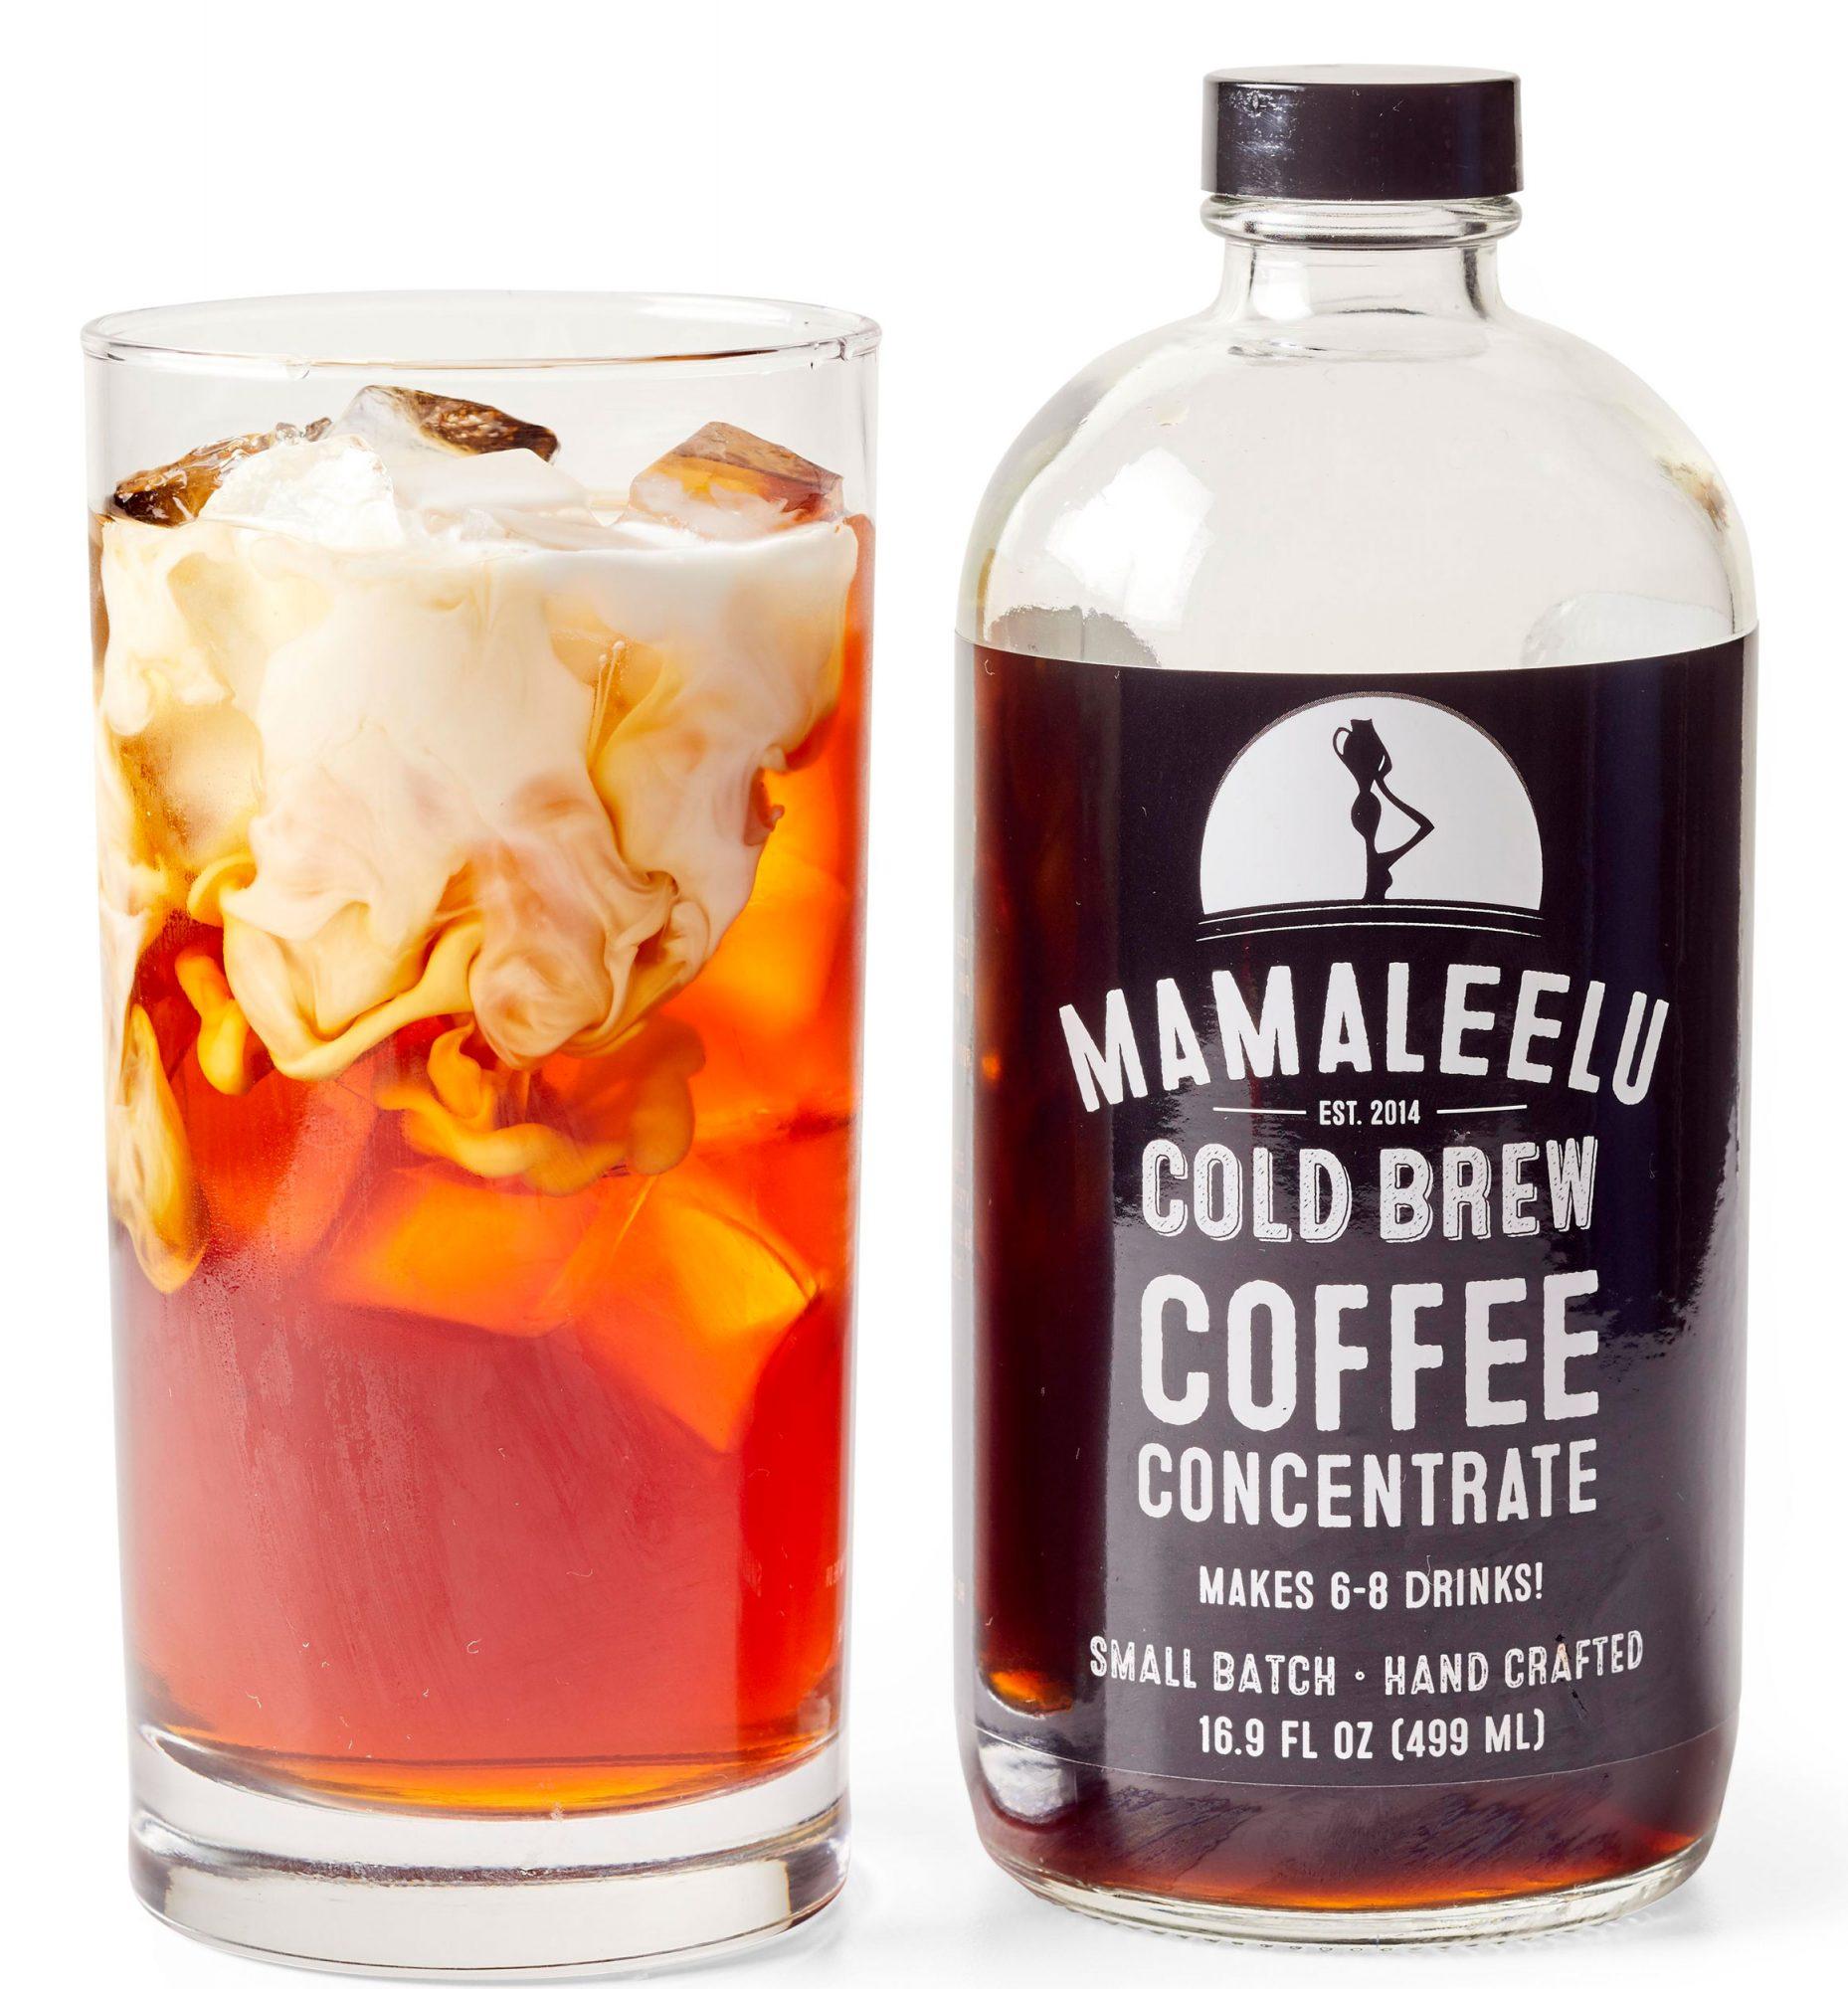 Mamaleelu Cold Brew